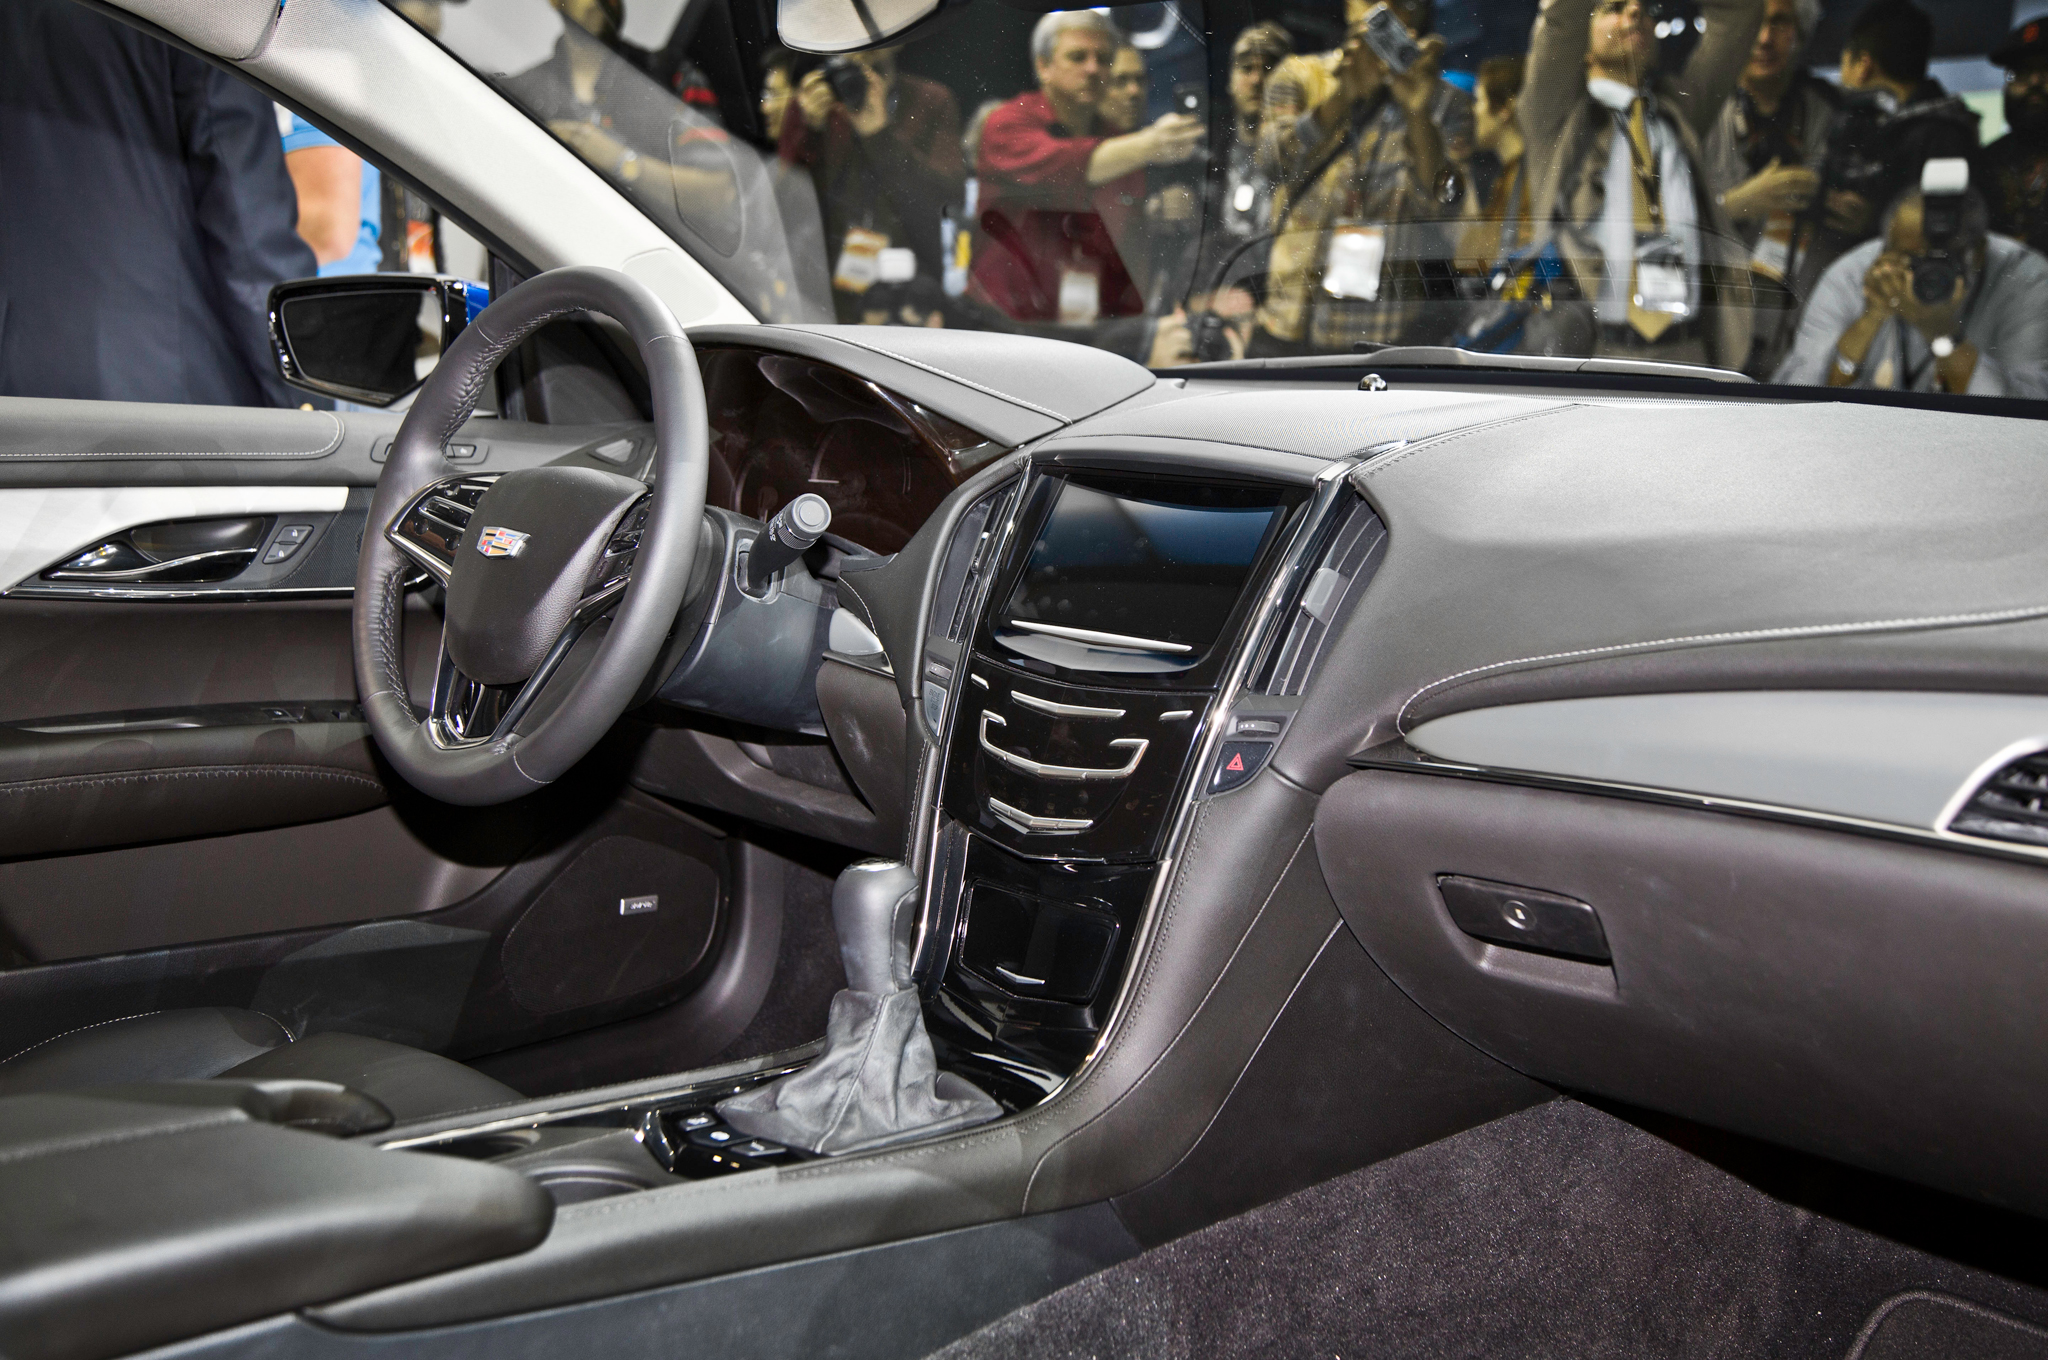 manual premium sedan reviews truck first quarters three coupe ats motor cadillac rwd rear prevnext trend test